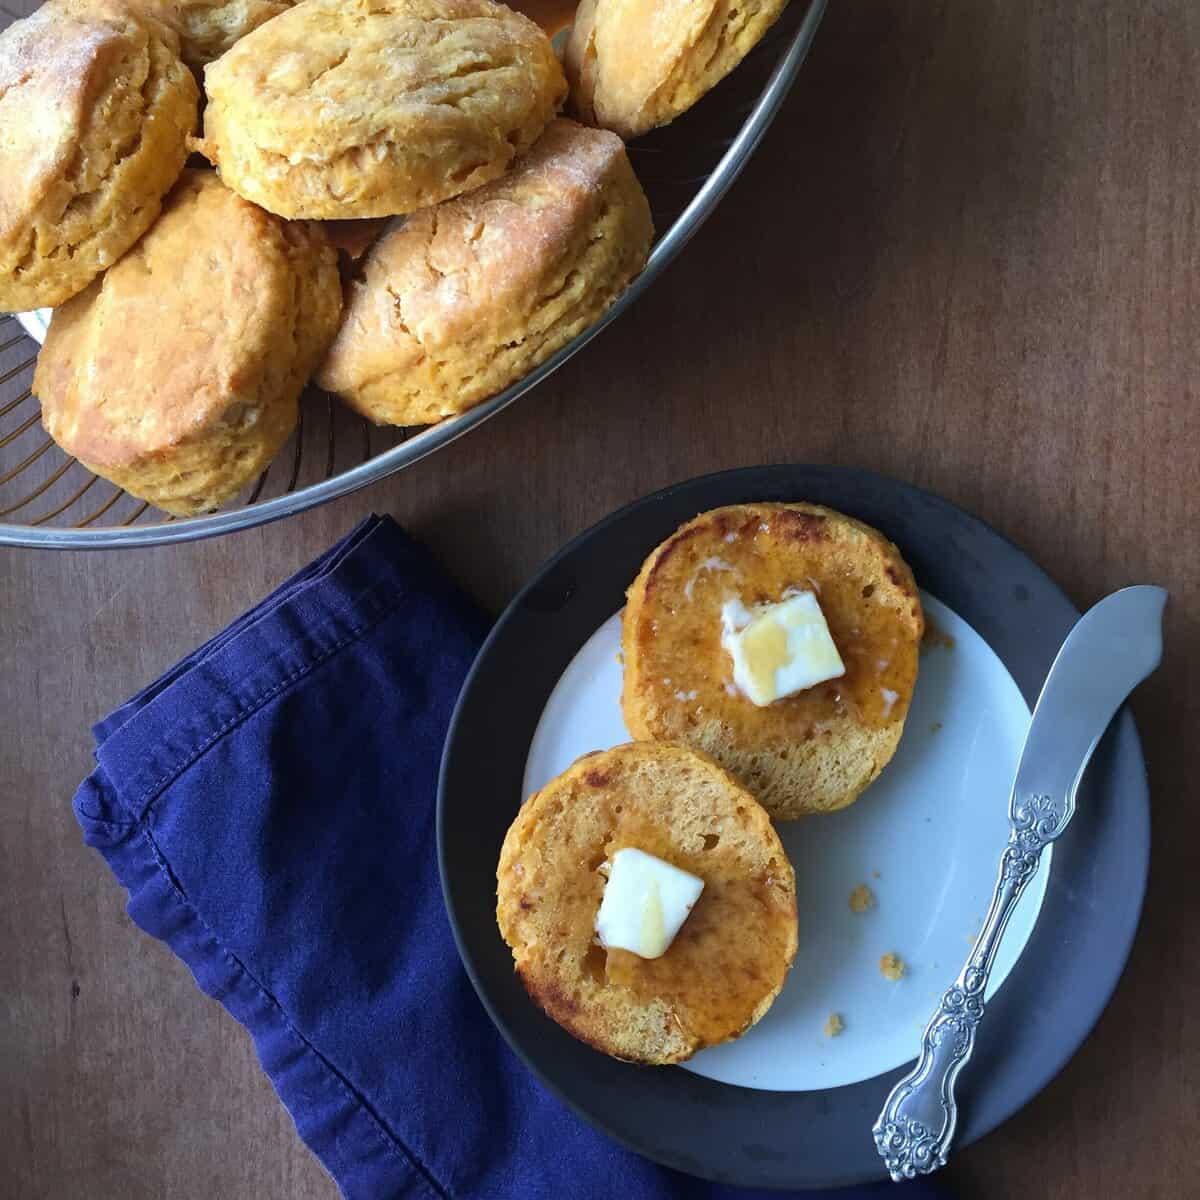 Jubilee's Sweet Potato Biscuits